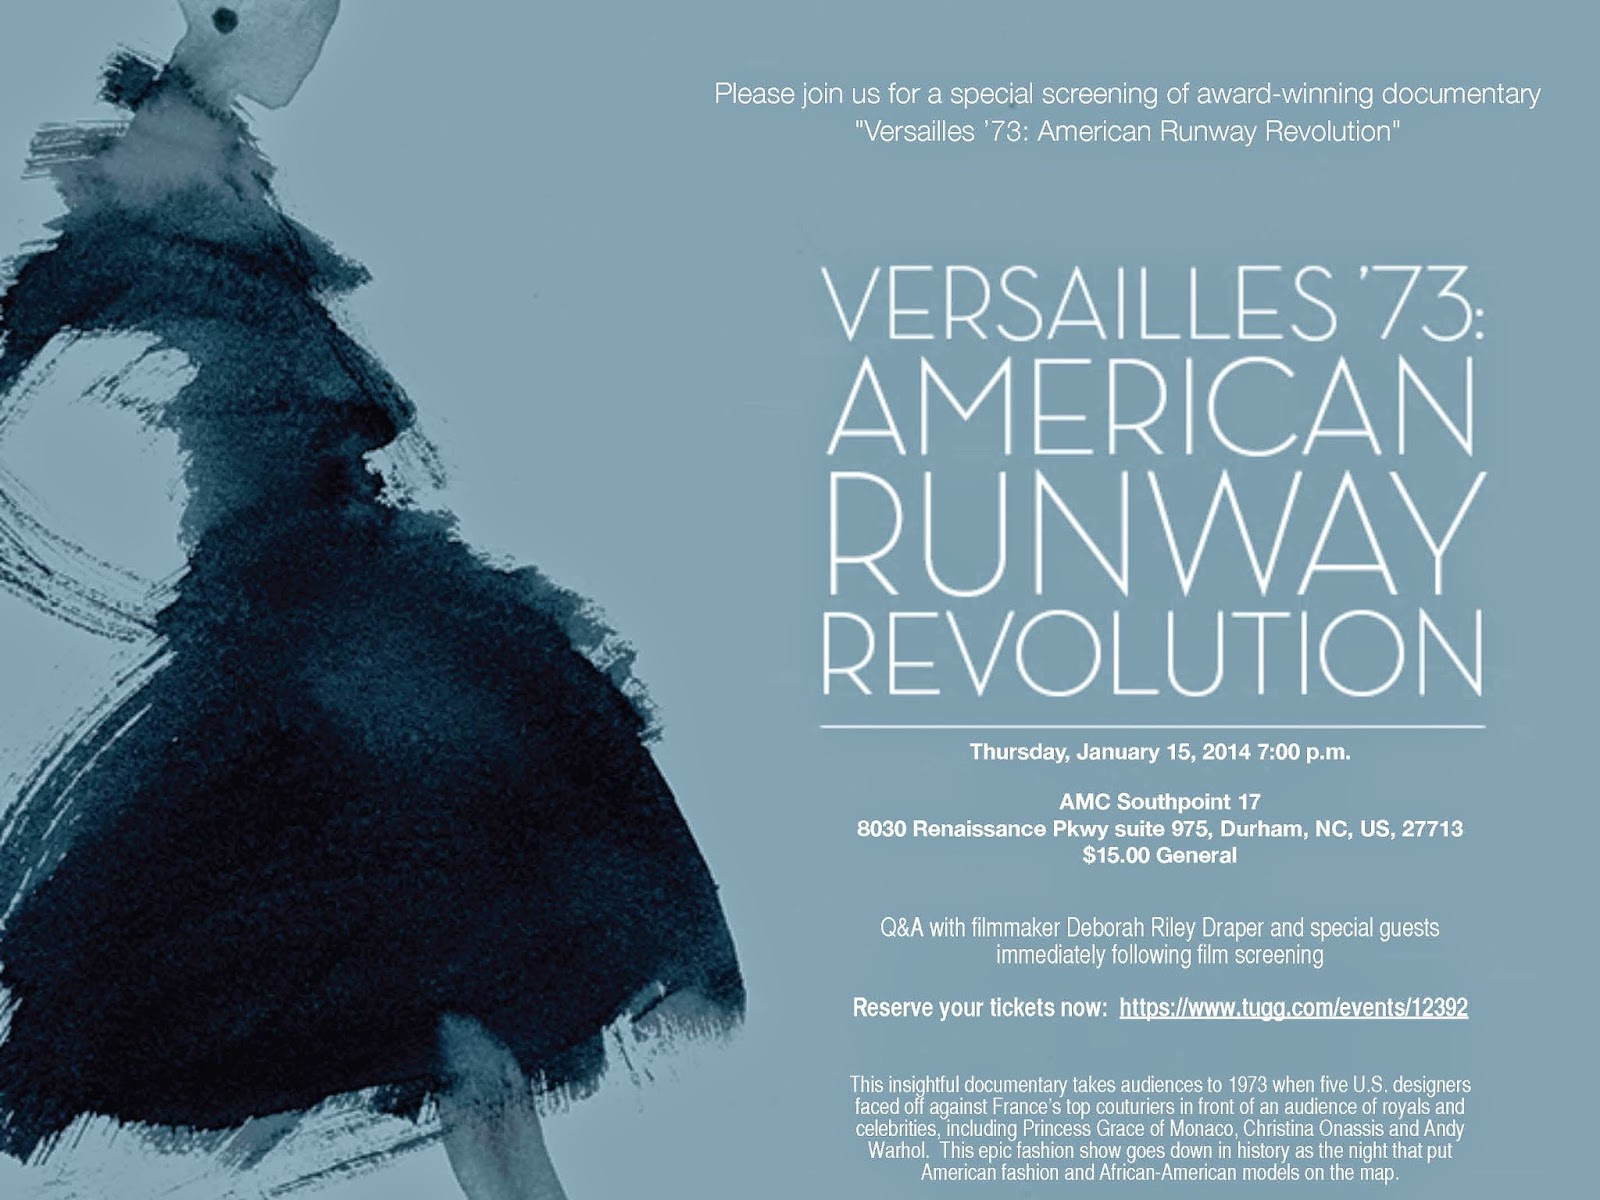 Versailles 73: American Runway Revolution Screening